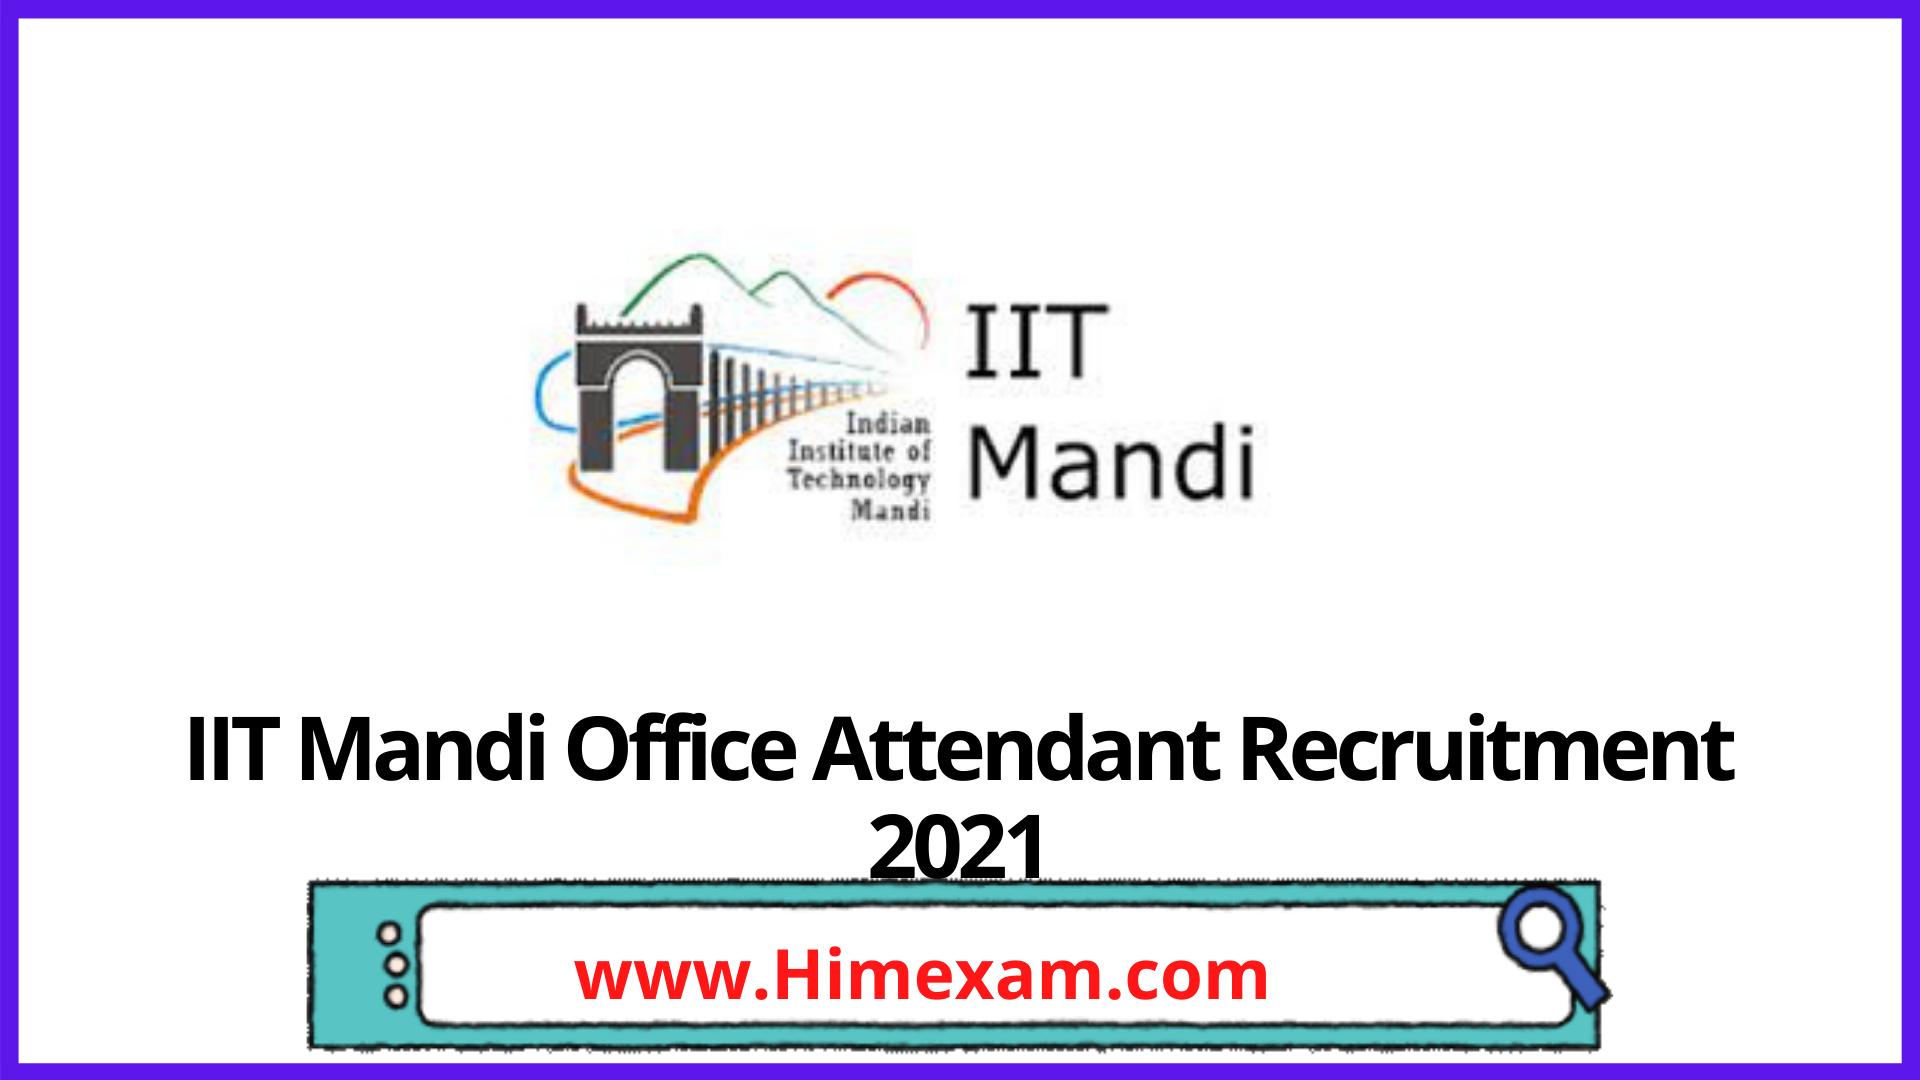 IIT Mandi Office Attendant Recruitment 2021